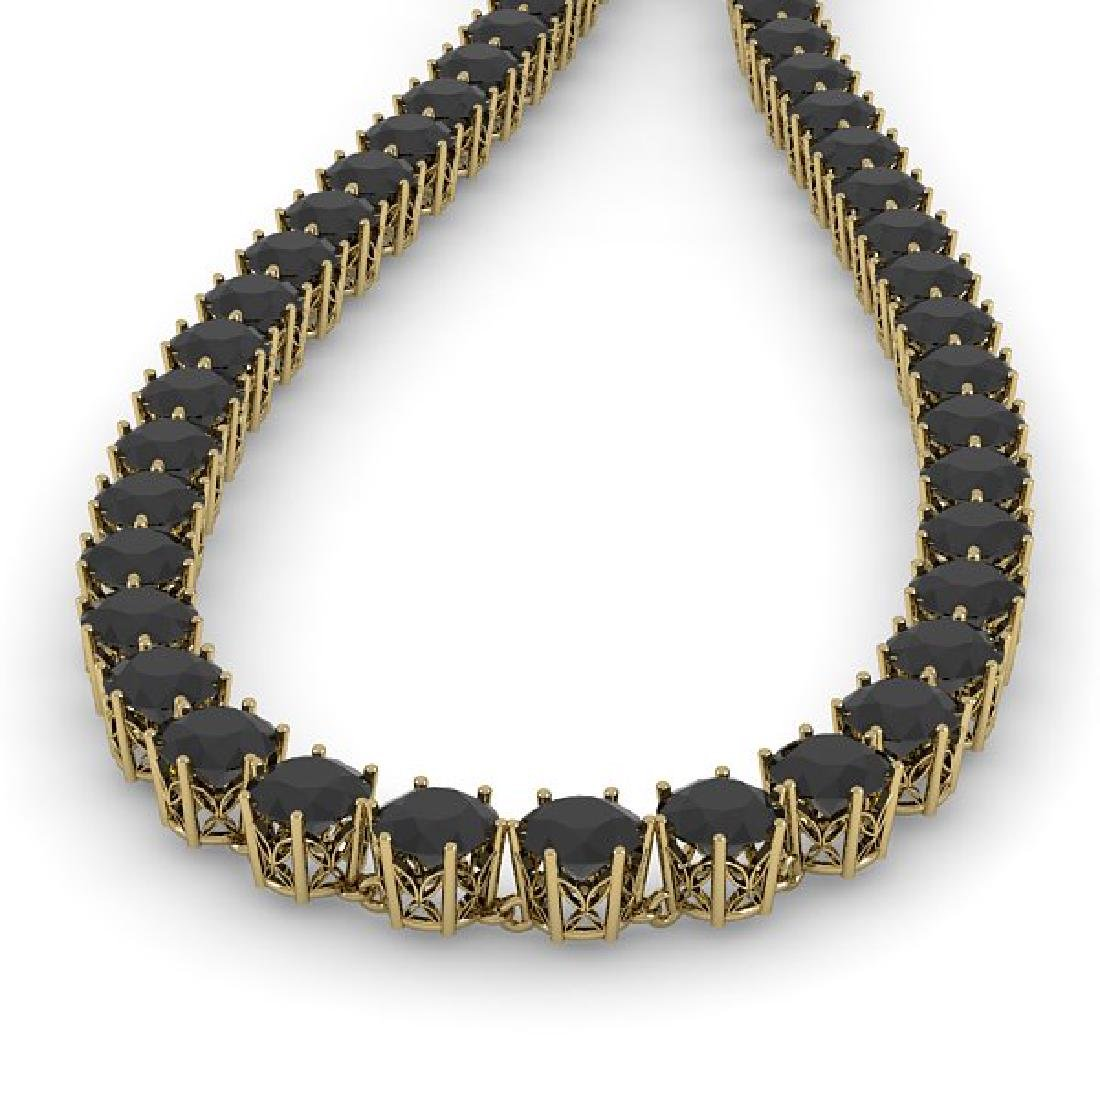 36 CTW Certified Black VS Diamond Necklace 14K Yellow - 2